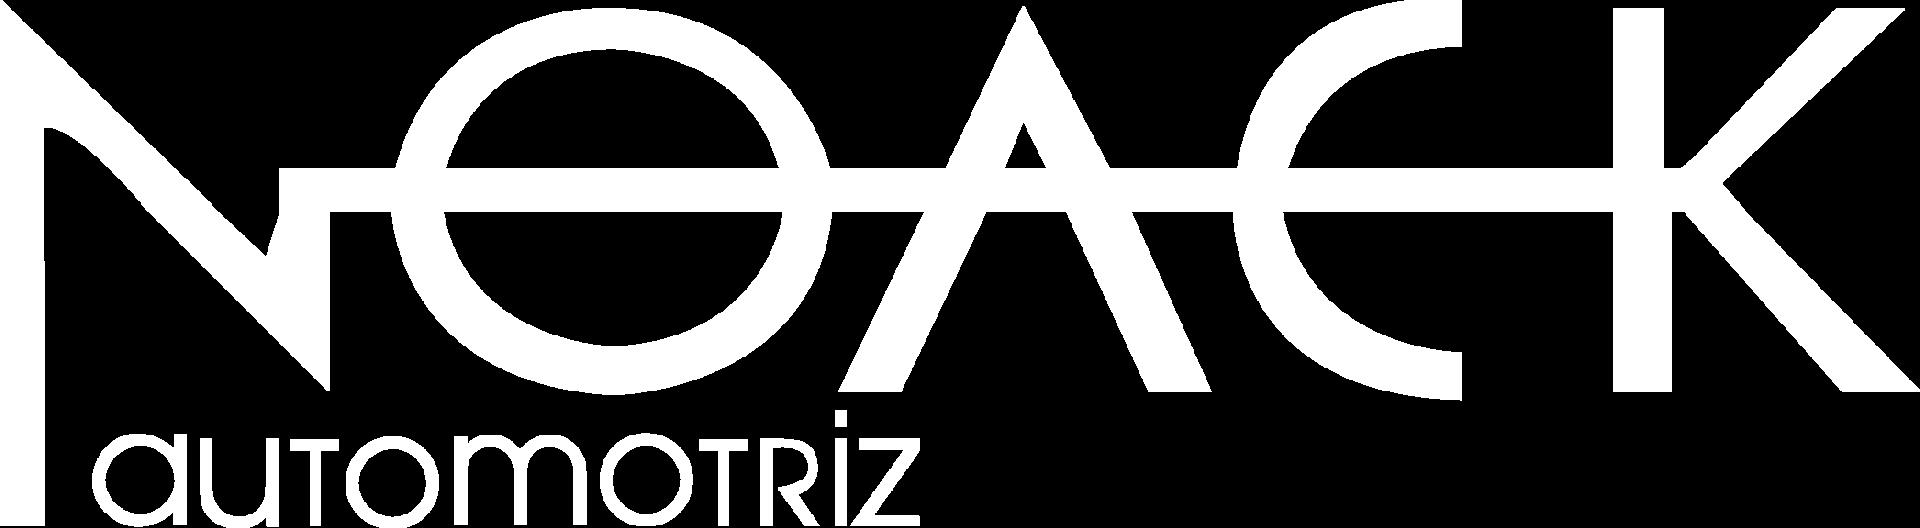 NOACK AUTOMOTRIZ